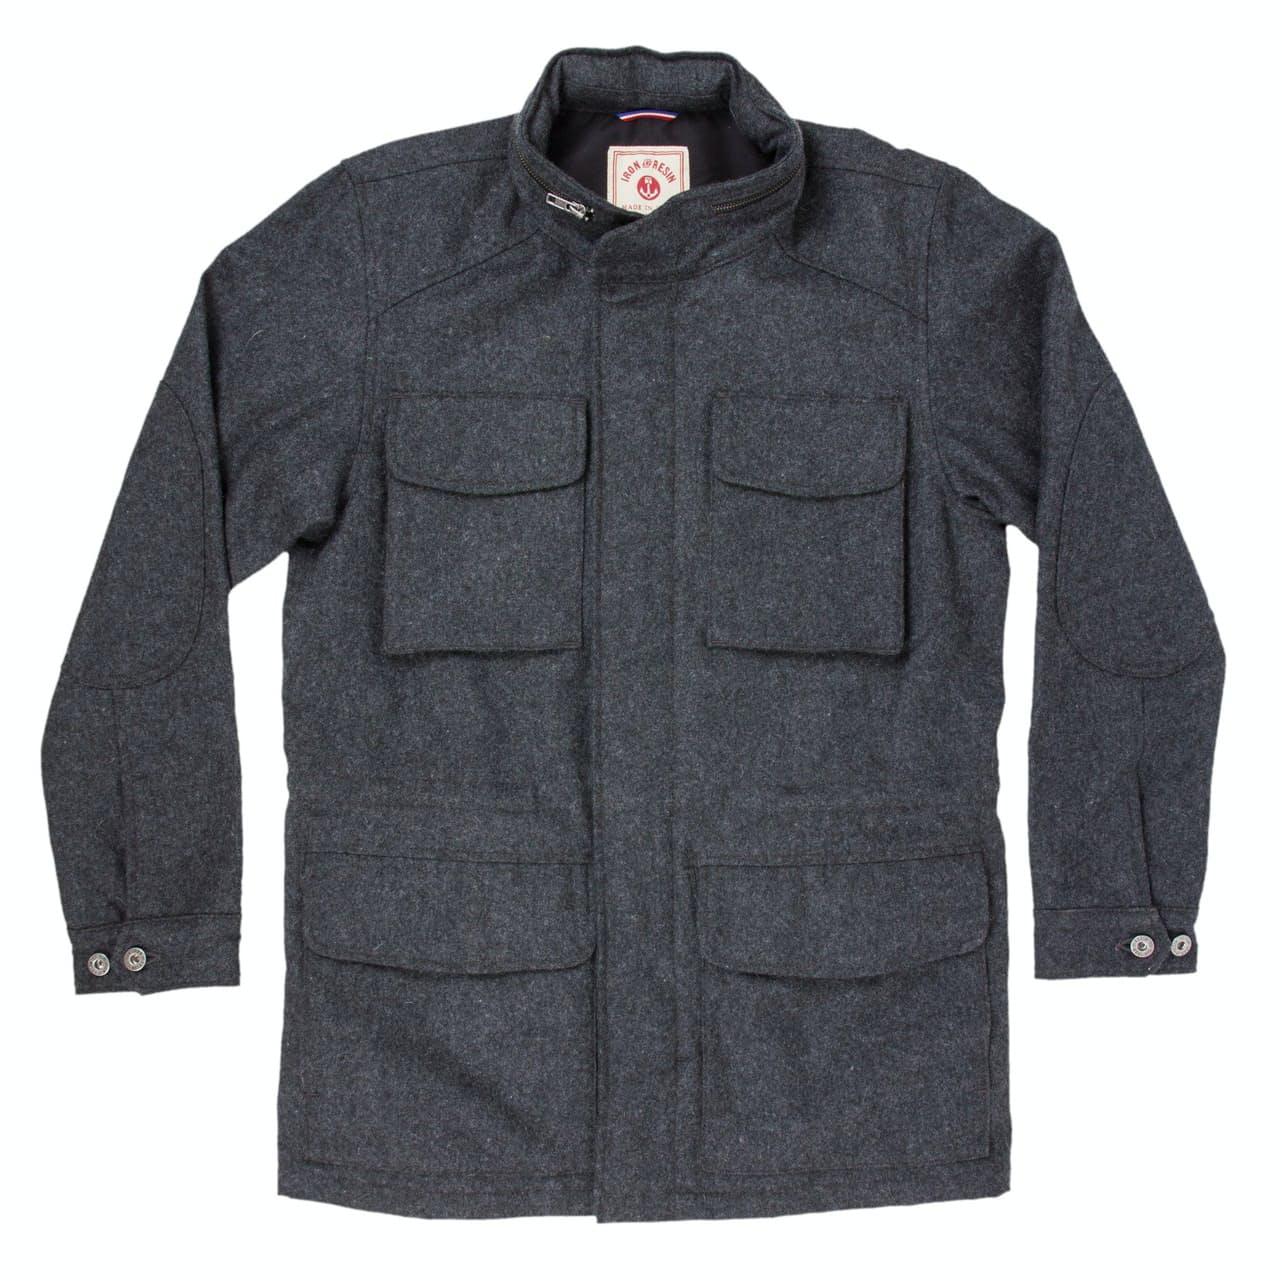 C9mihgbvc0 iron and resin barracks jacket 0 original